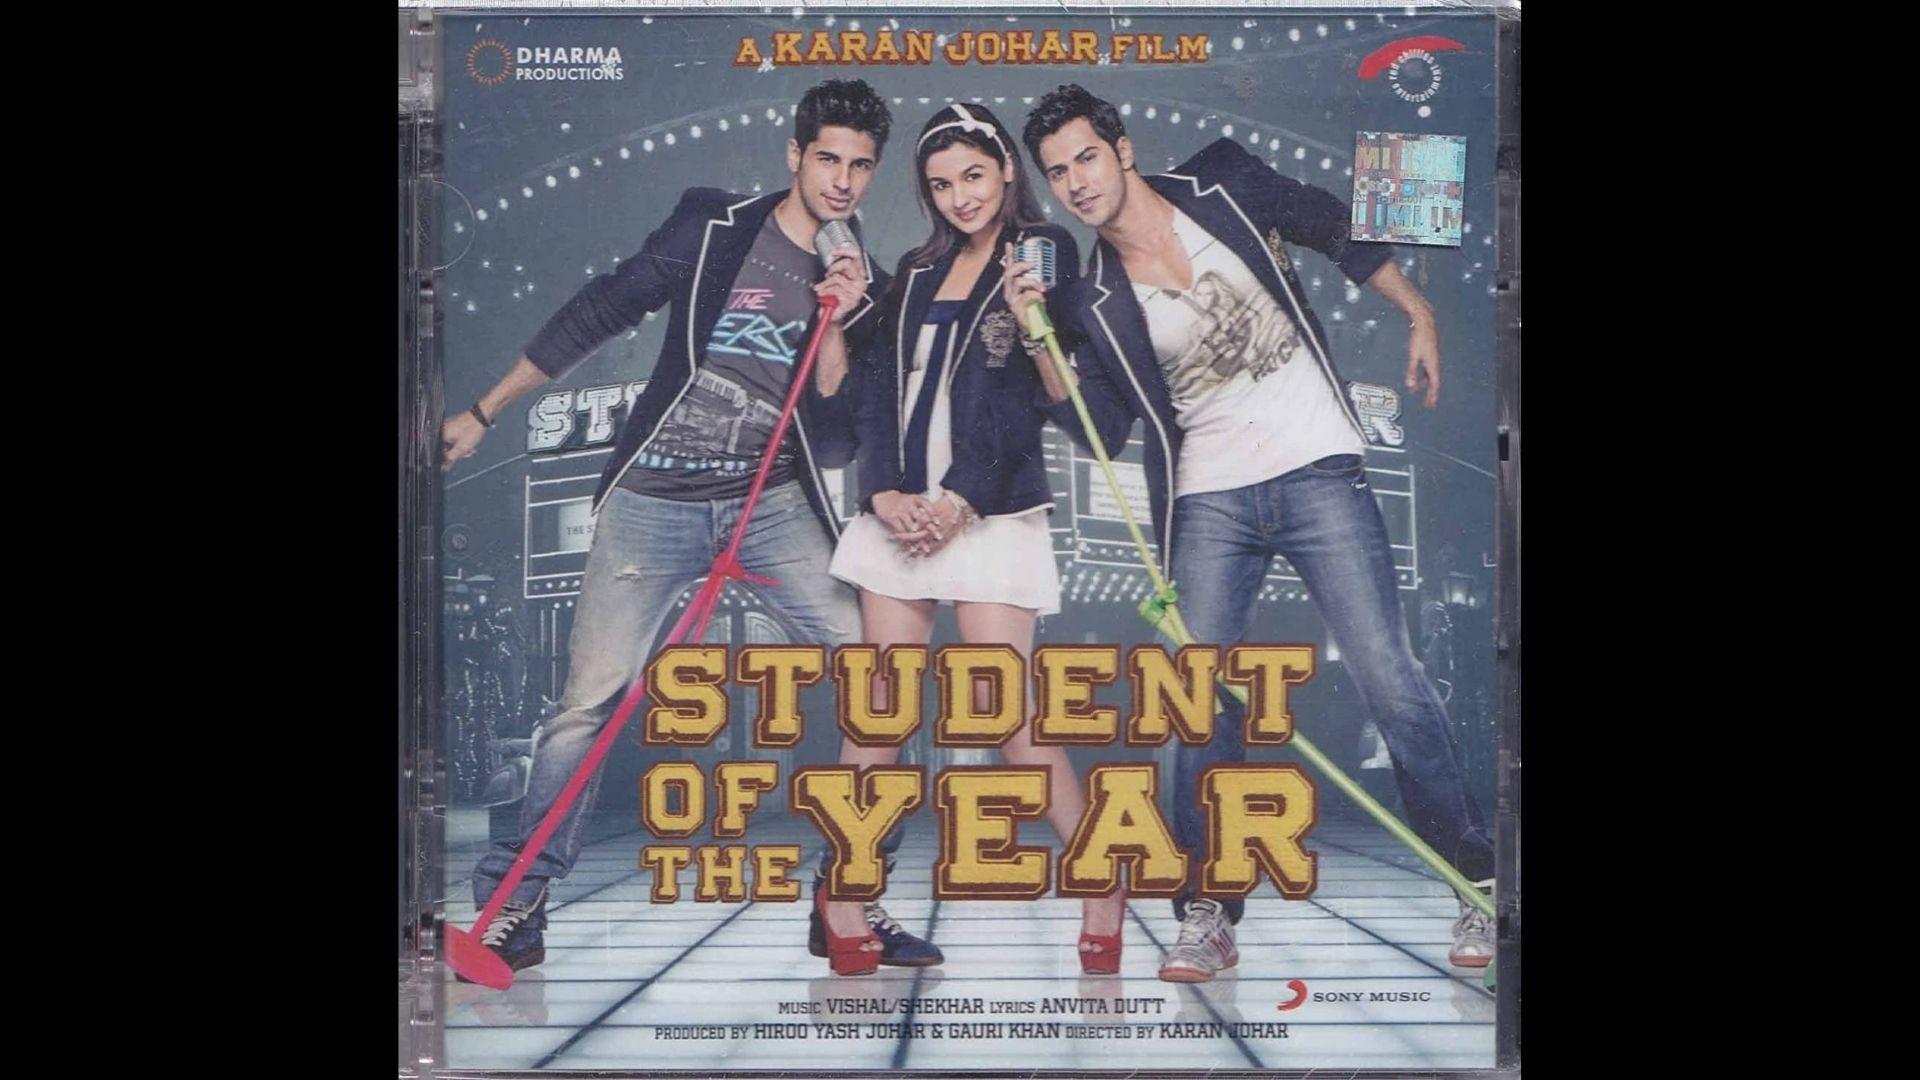 Student Of The Year: Alia Bhatt, Varun Dhawan And Sidharth Malhotra Starrer Clocks 9; Director Karan Johar Pens A Heartfelt Note For The Trio